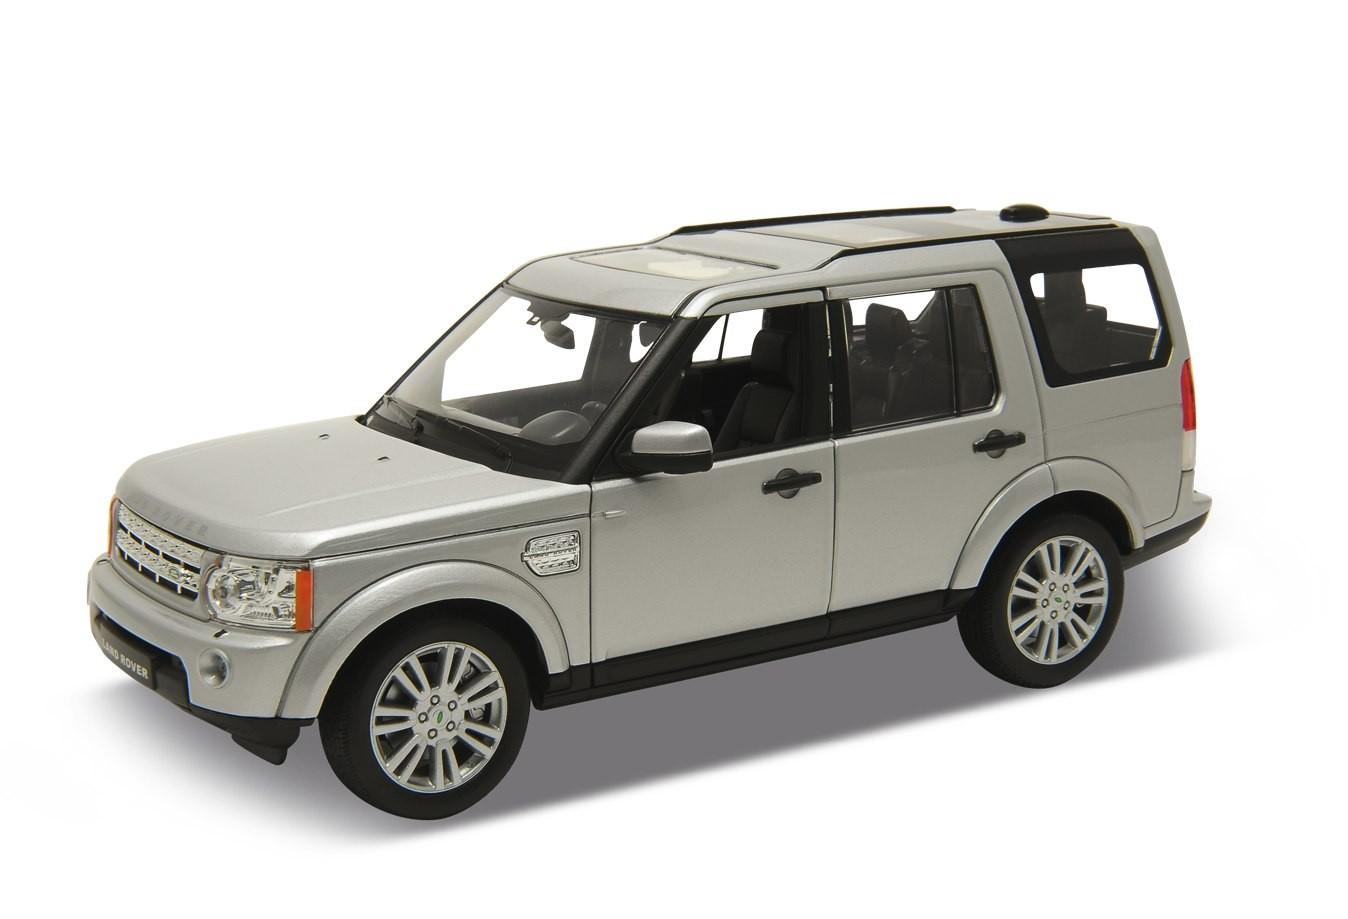 Welly Land Rover Discovery 4 Stříbrný 1:24